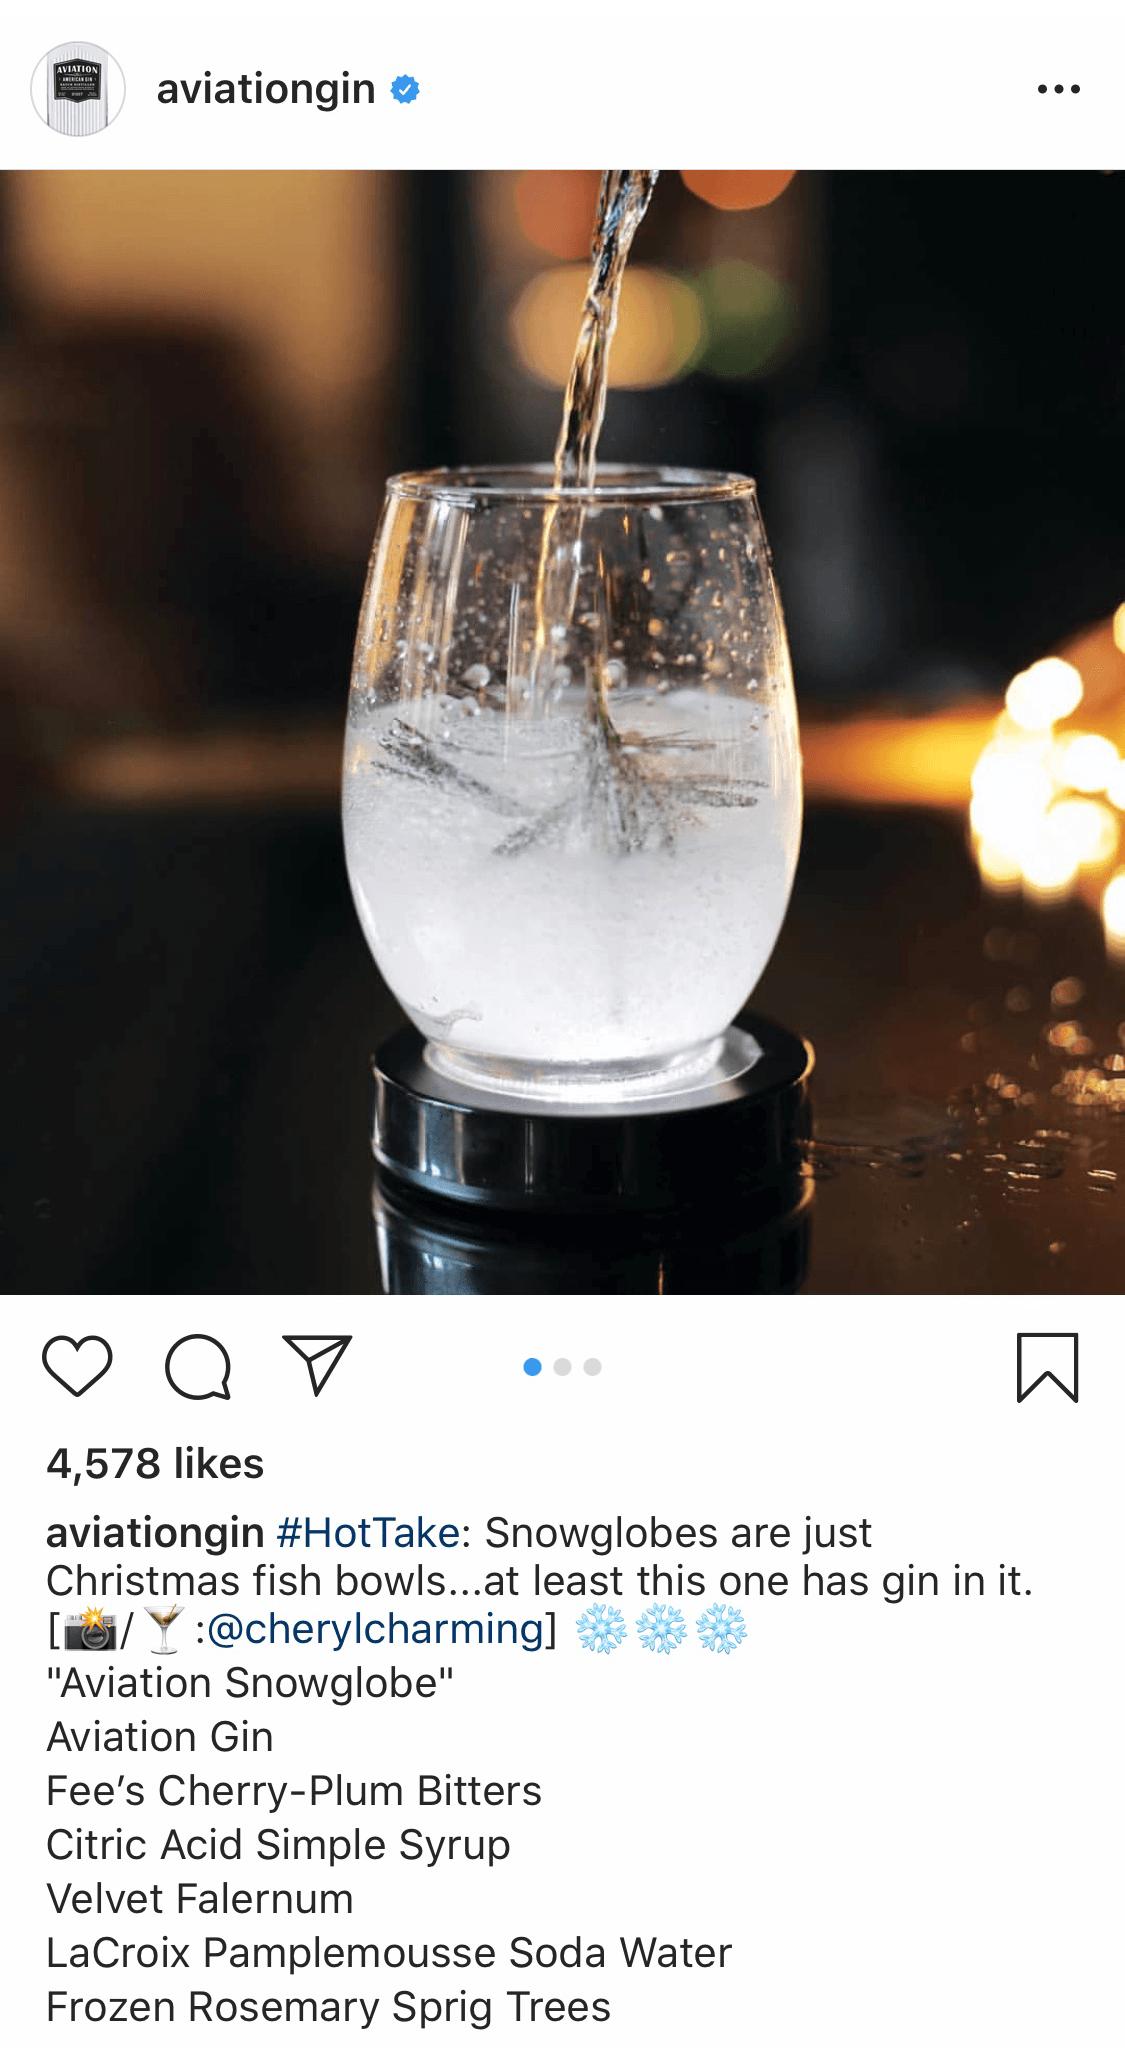 @aviationgin Instagram post